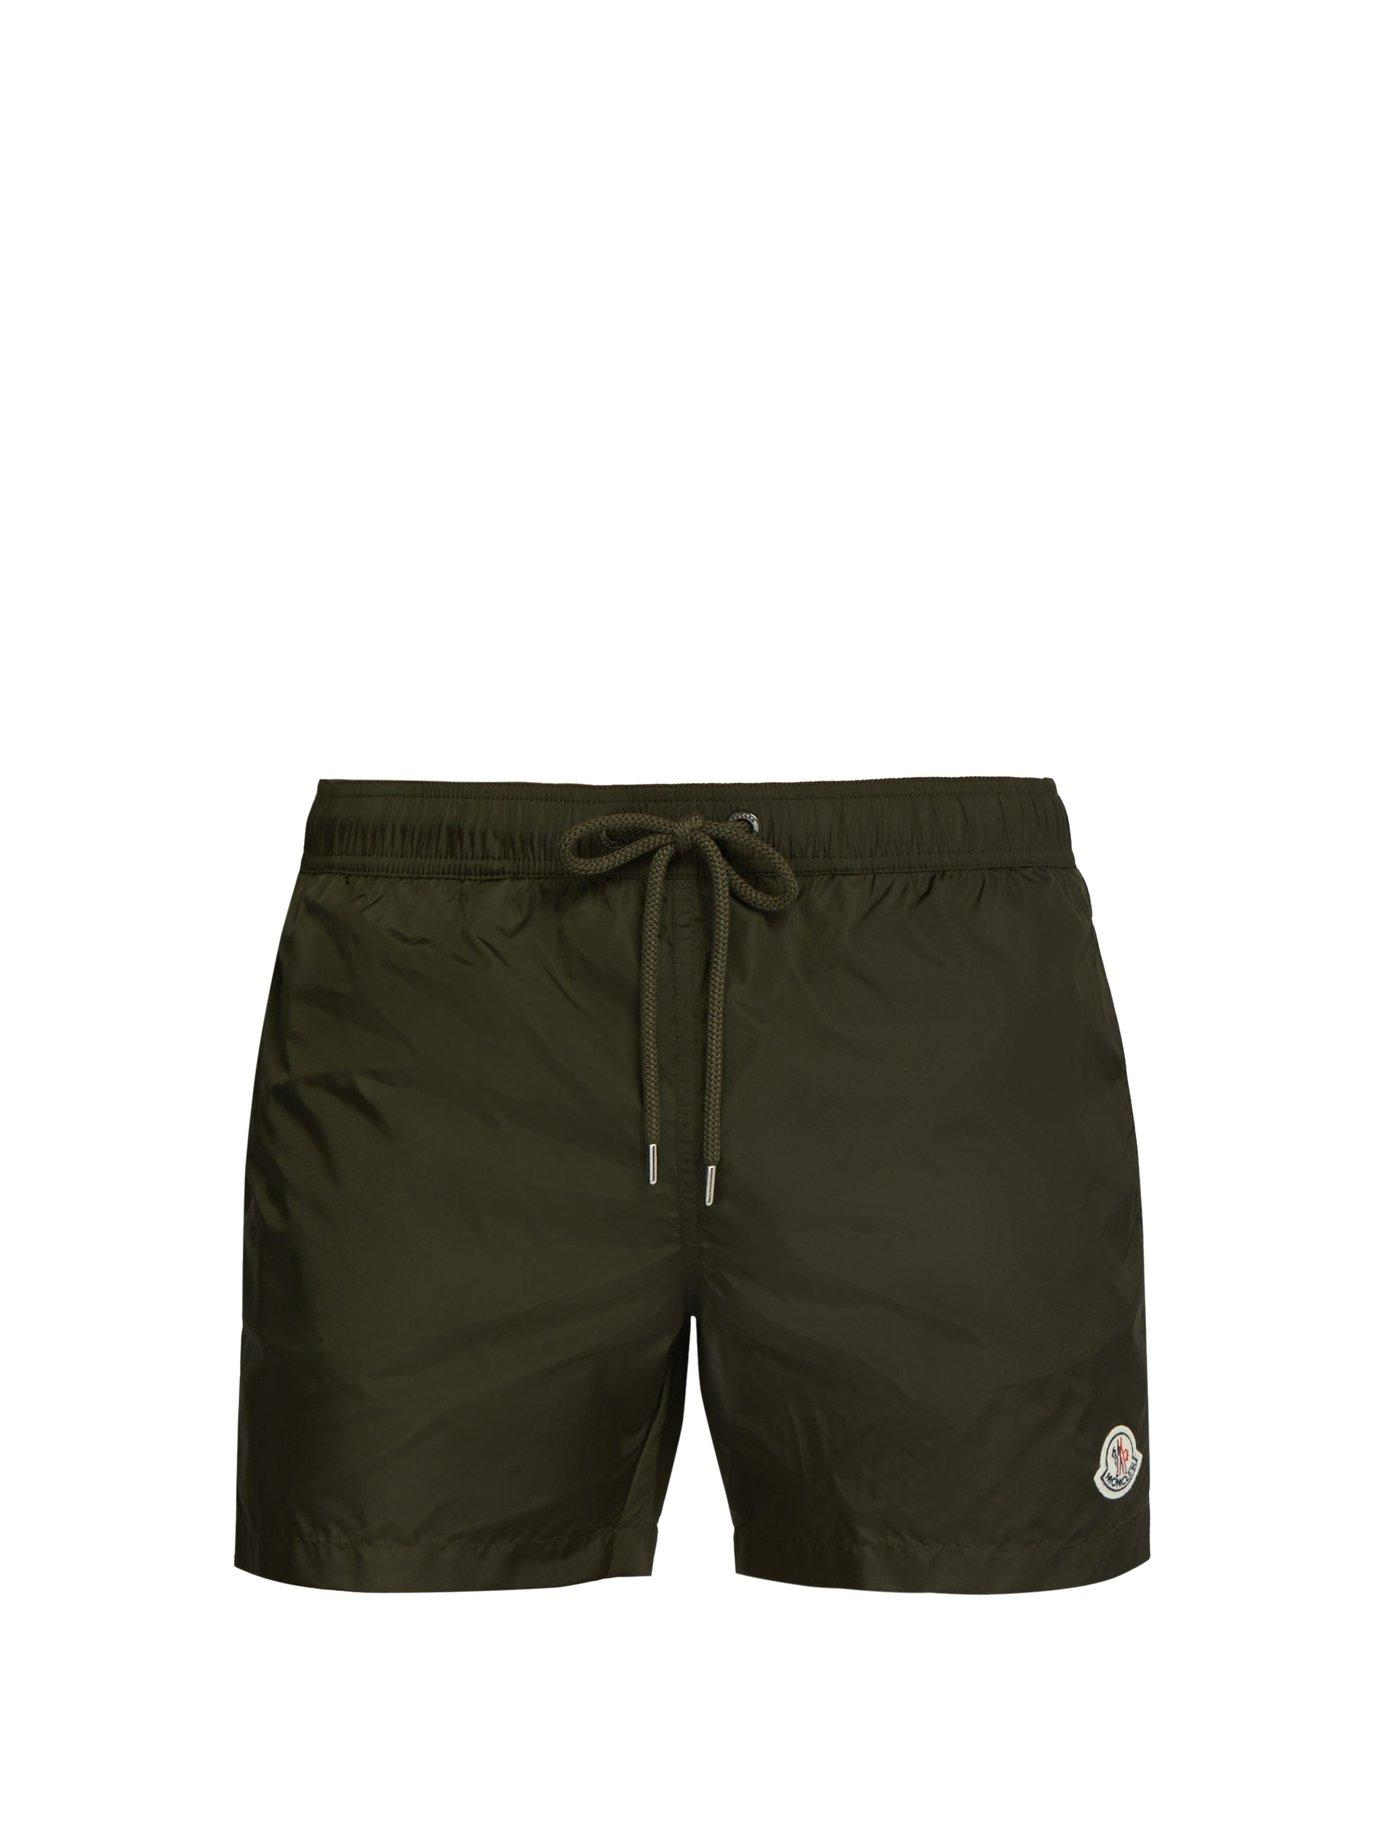 5ffef34c08 Moncler Logo Appliqué Swim Shorts in Green for Men - Lyst